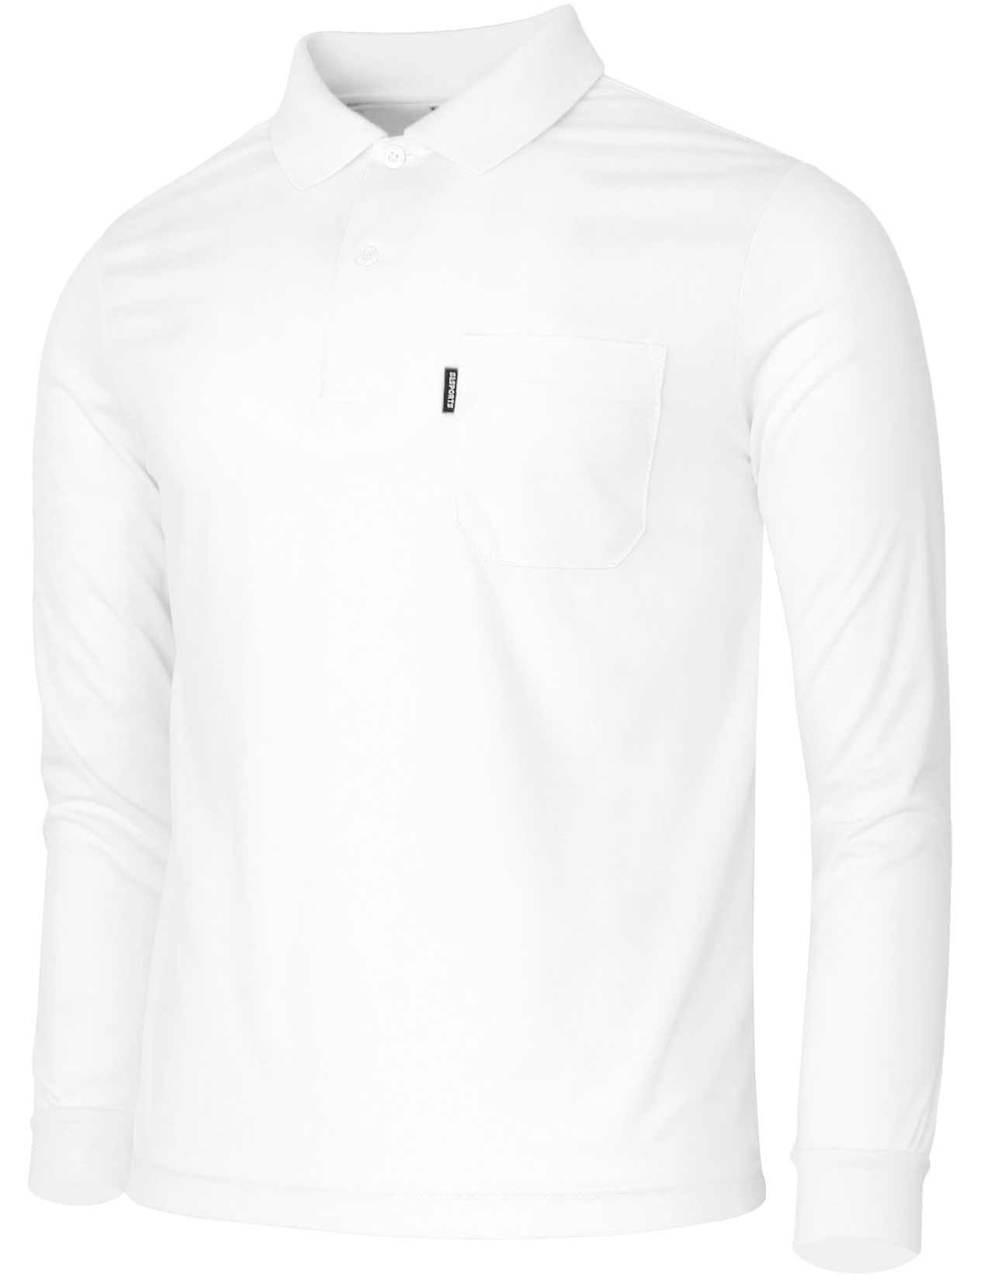 28b369fff Polo long sleeves various colors polo Plain shirt-Unisex